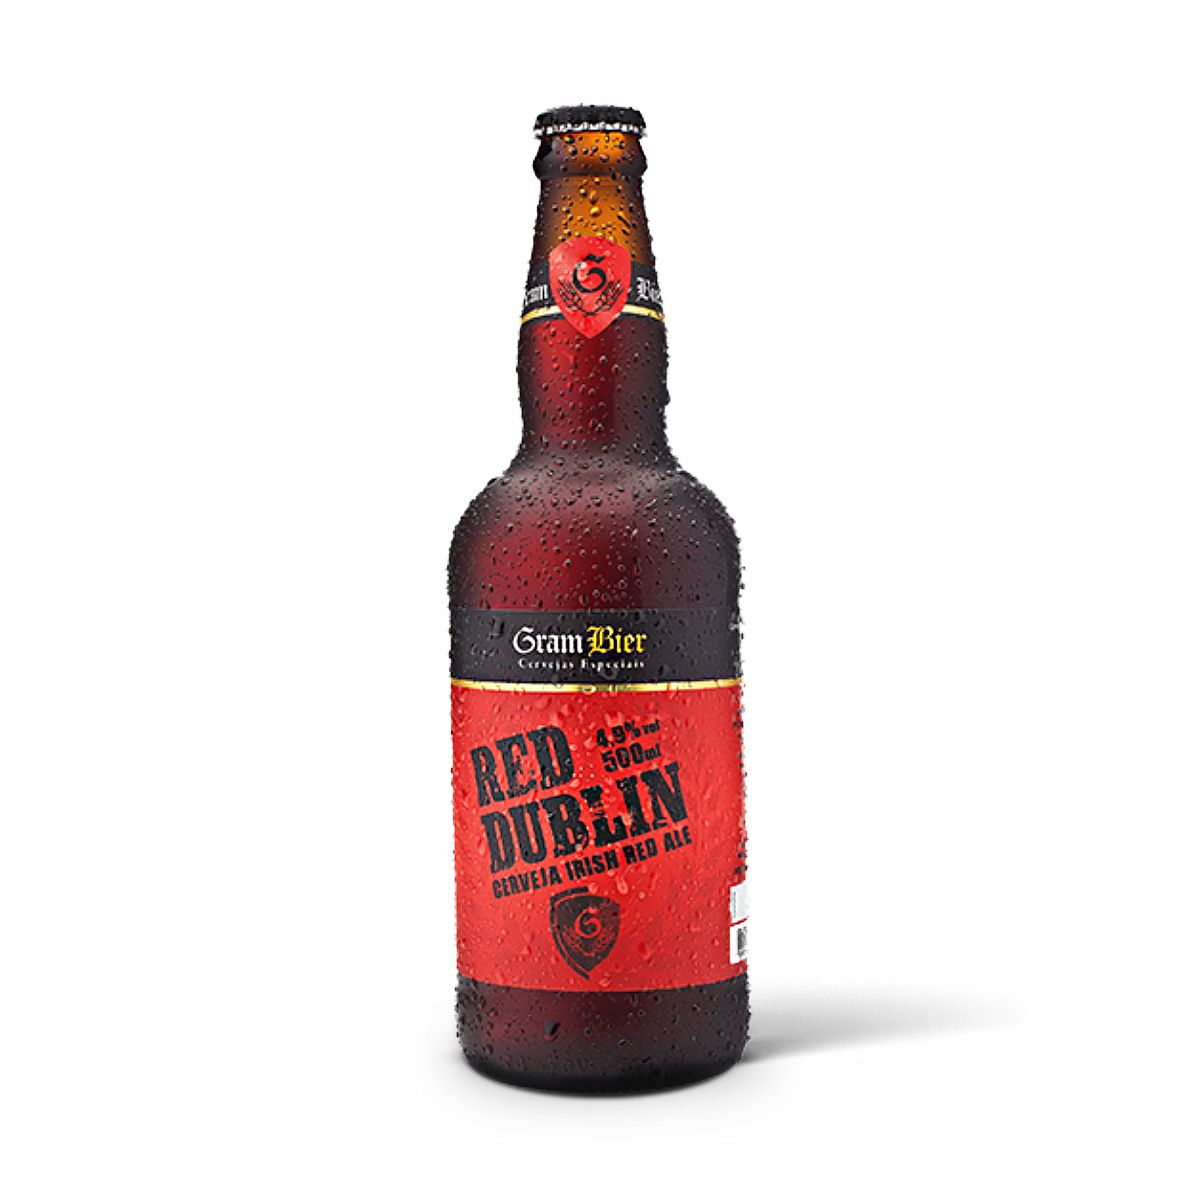 Gram Bier Irish Red Ale Red Dublin 500ml